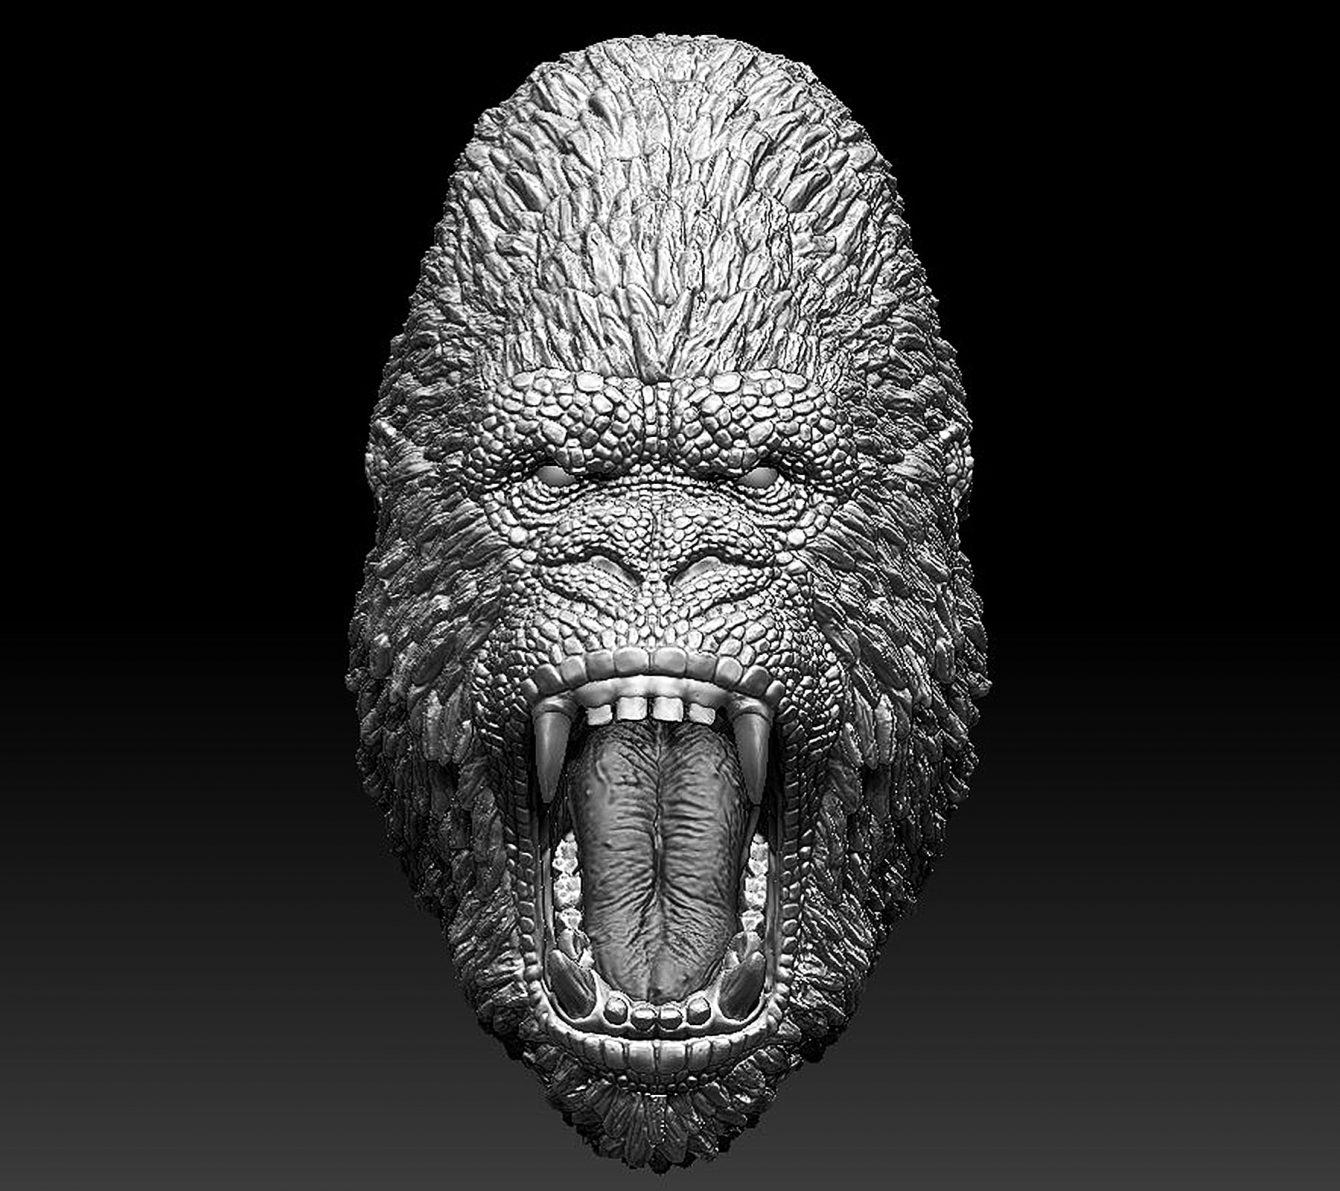 Godzilla-Kong Hybrid Head